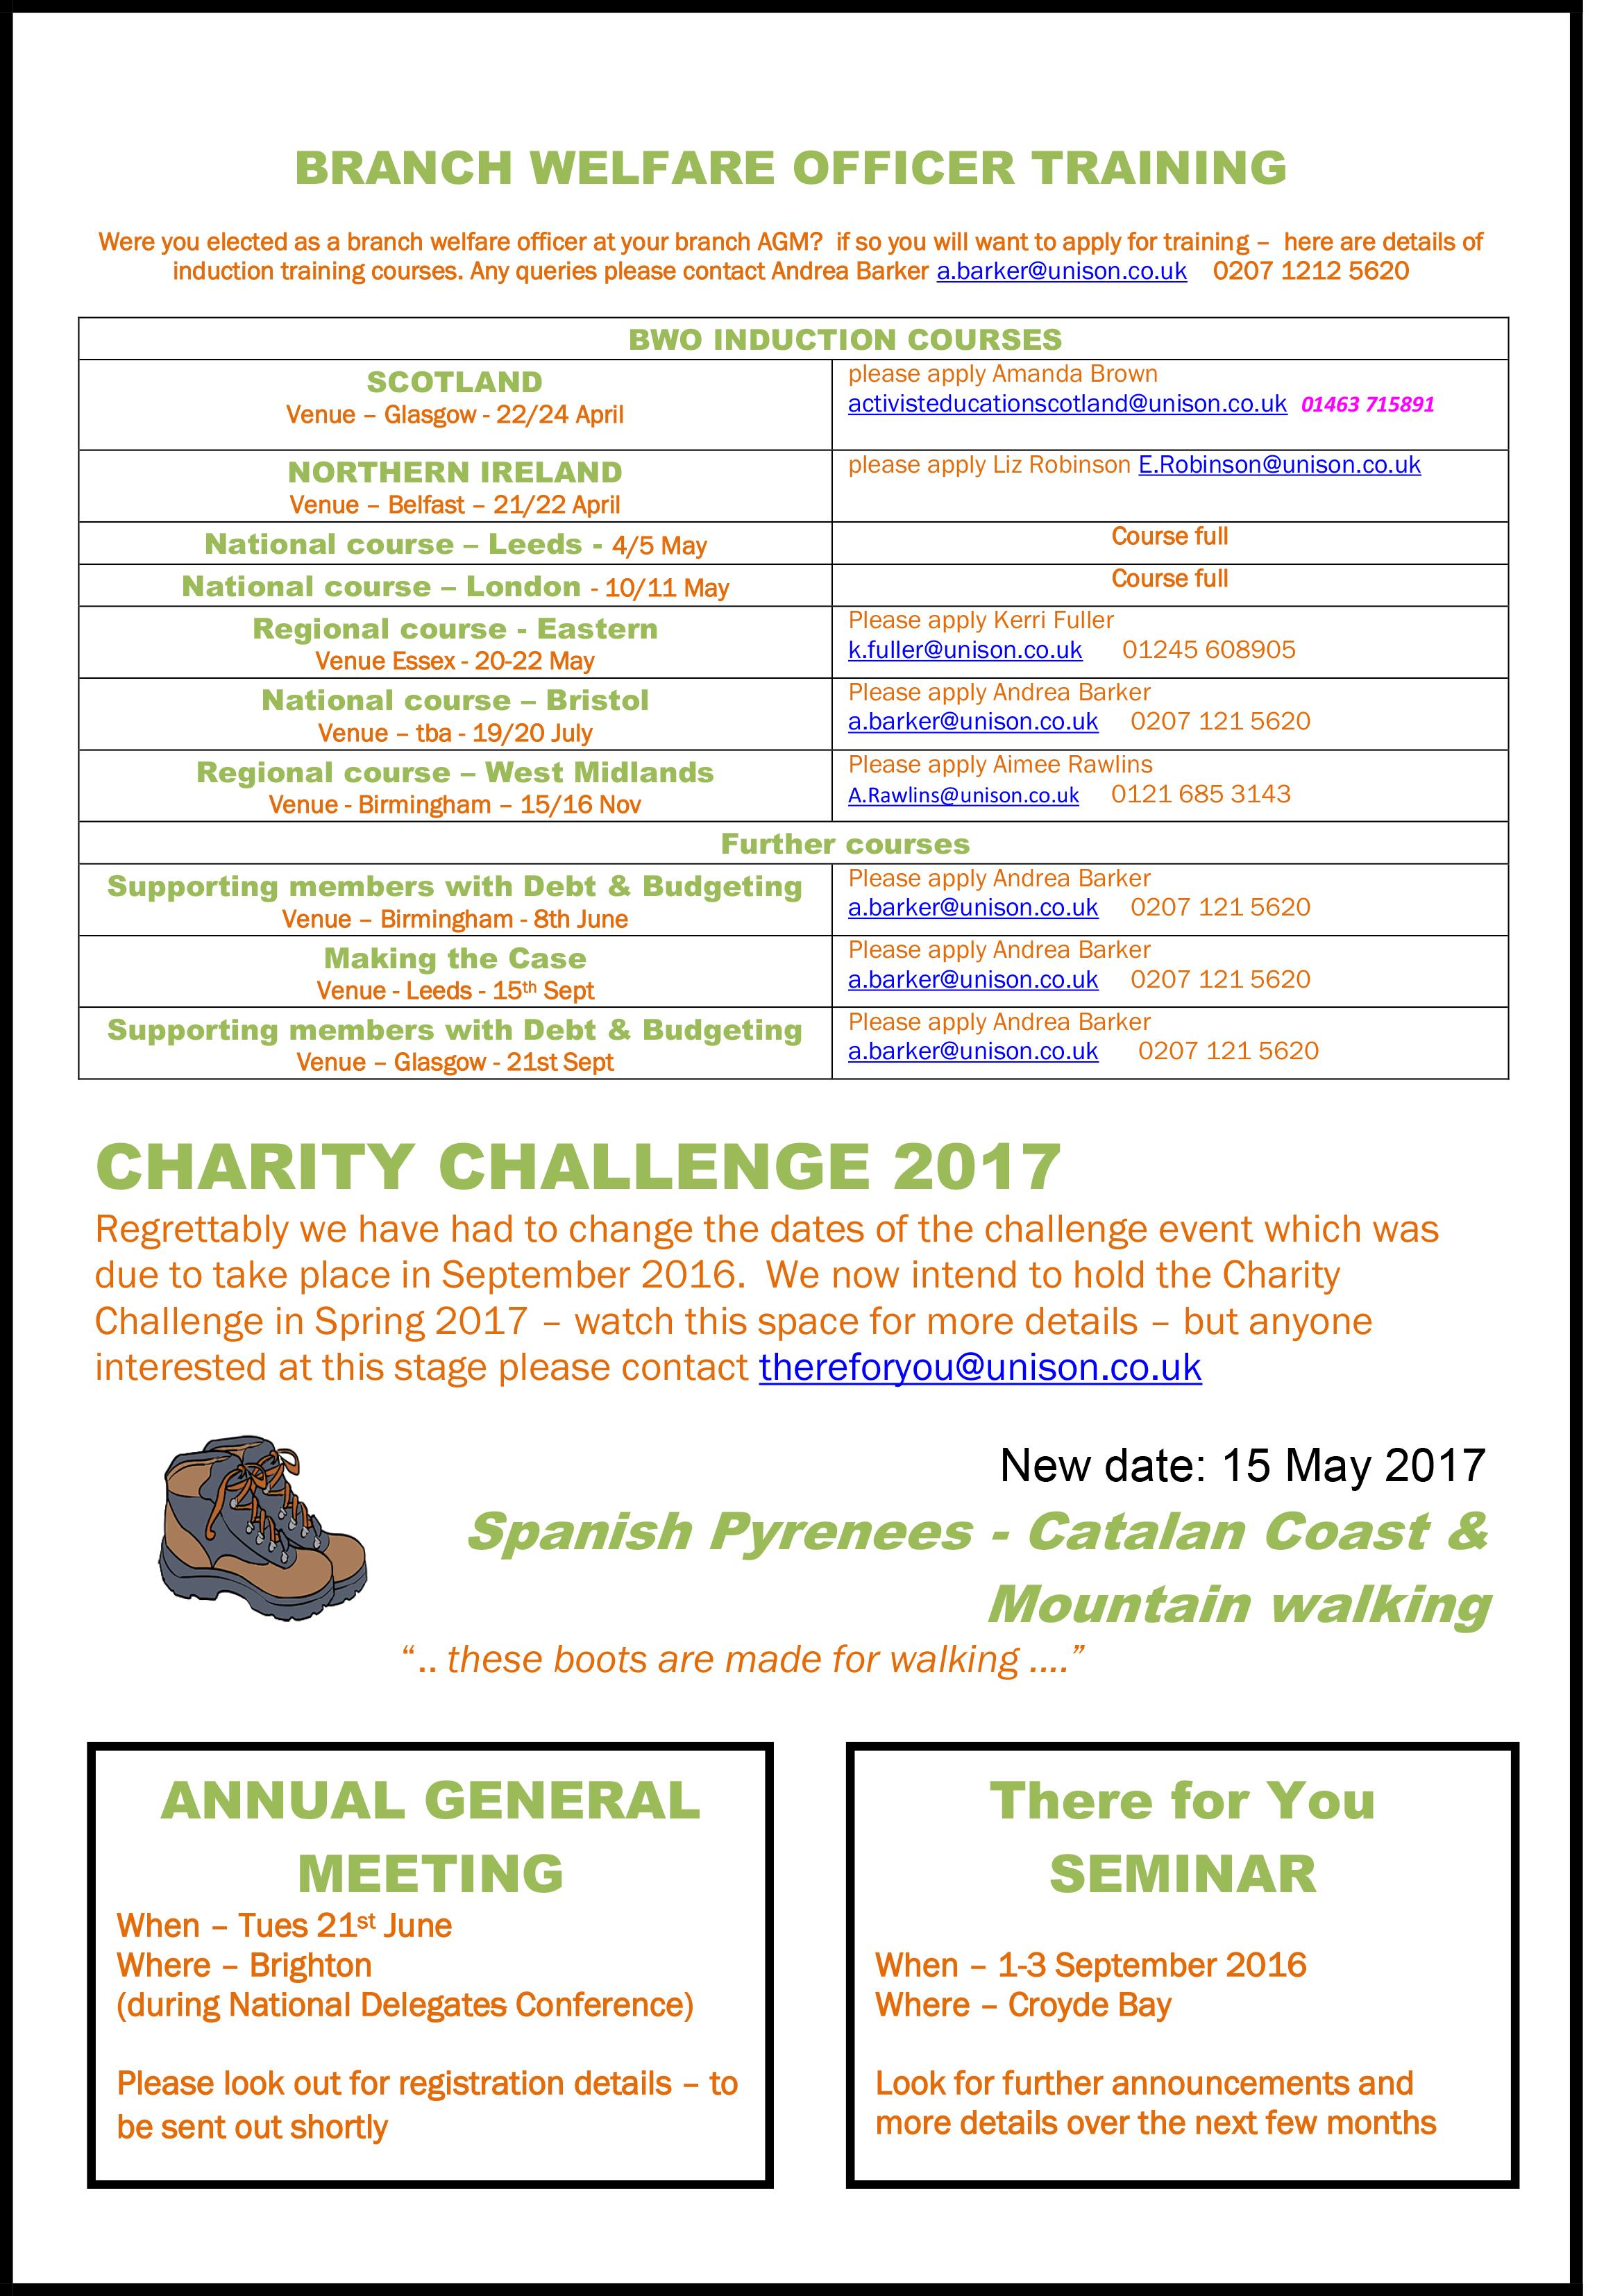 UNISON-Welfare-Newsletter-april-2016-2